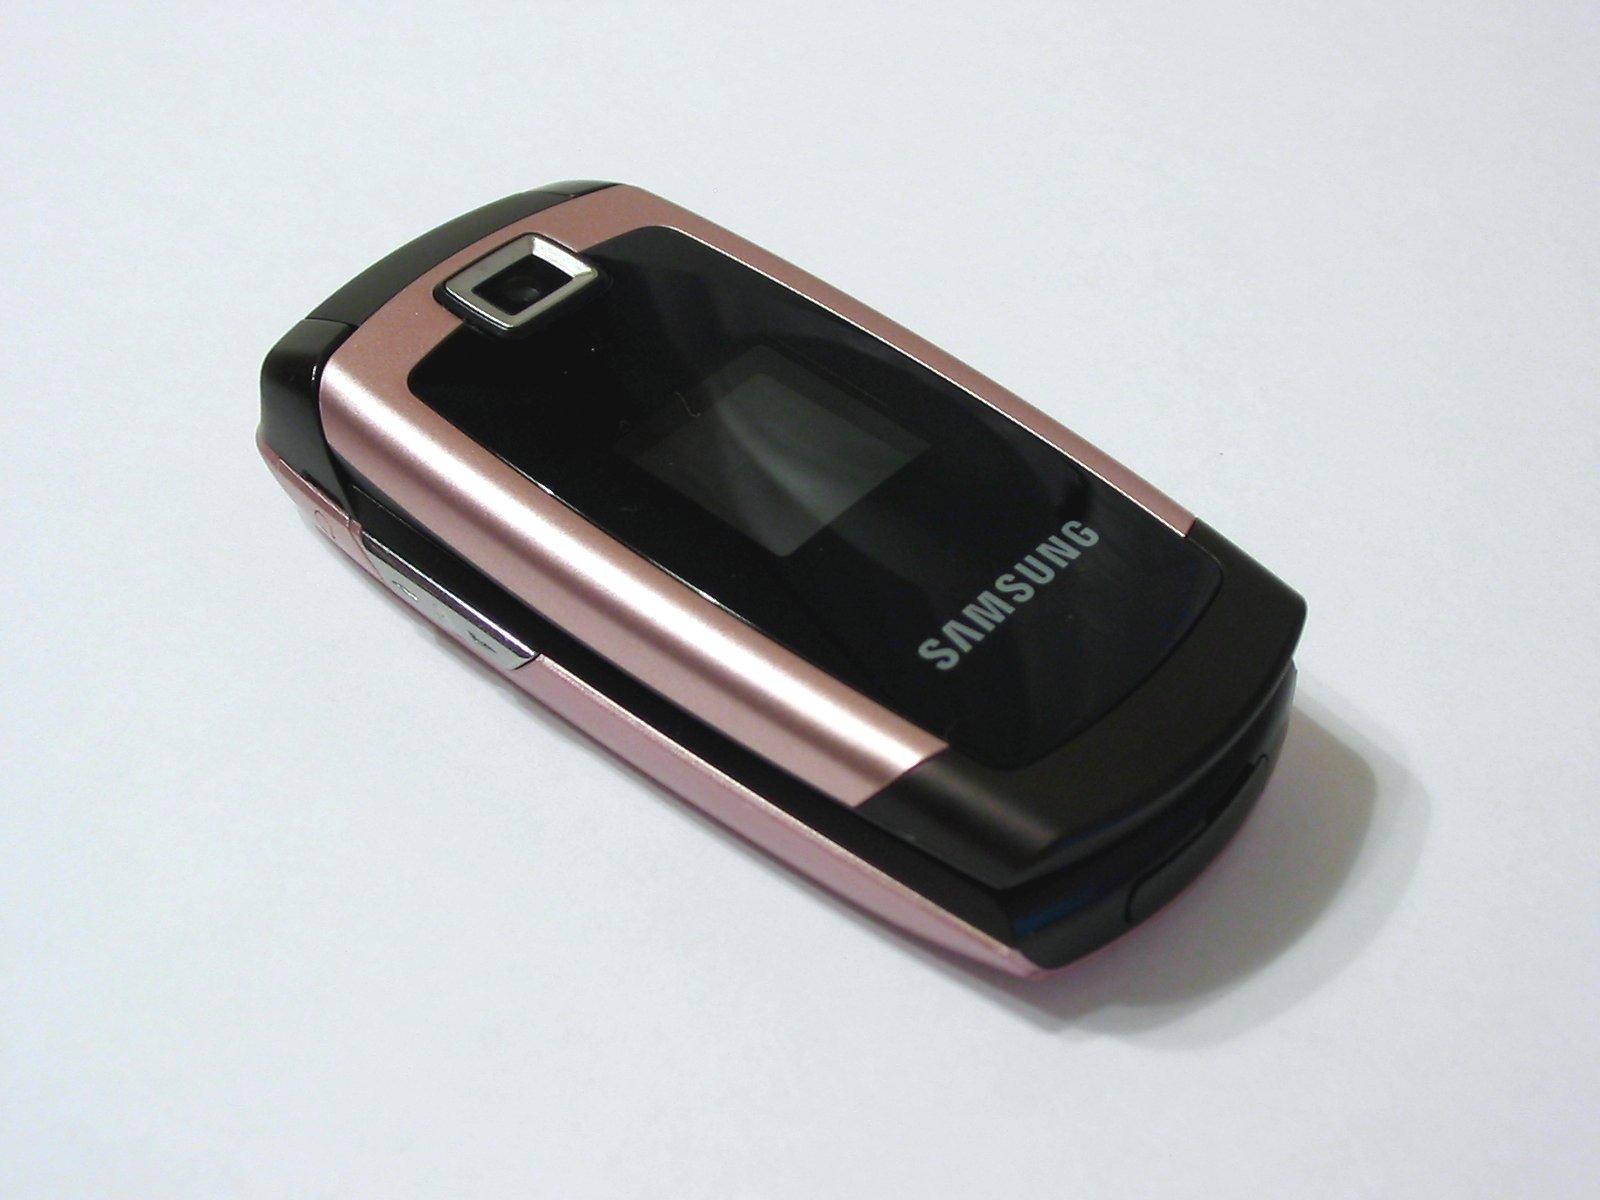 file cell phone samsung sgh x680 ubt jpeg   wikipedia